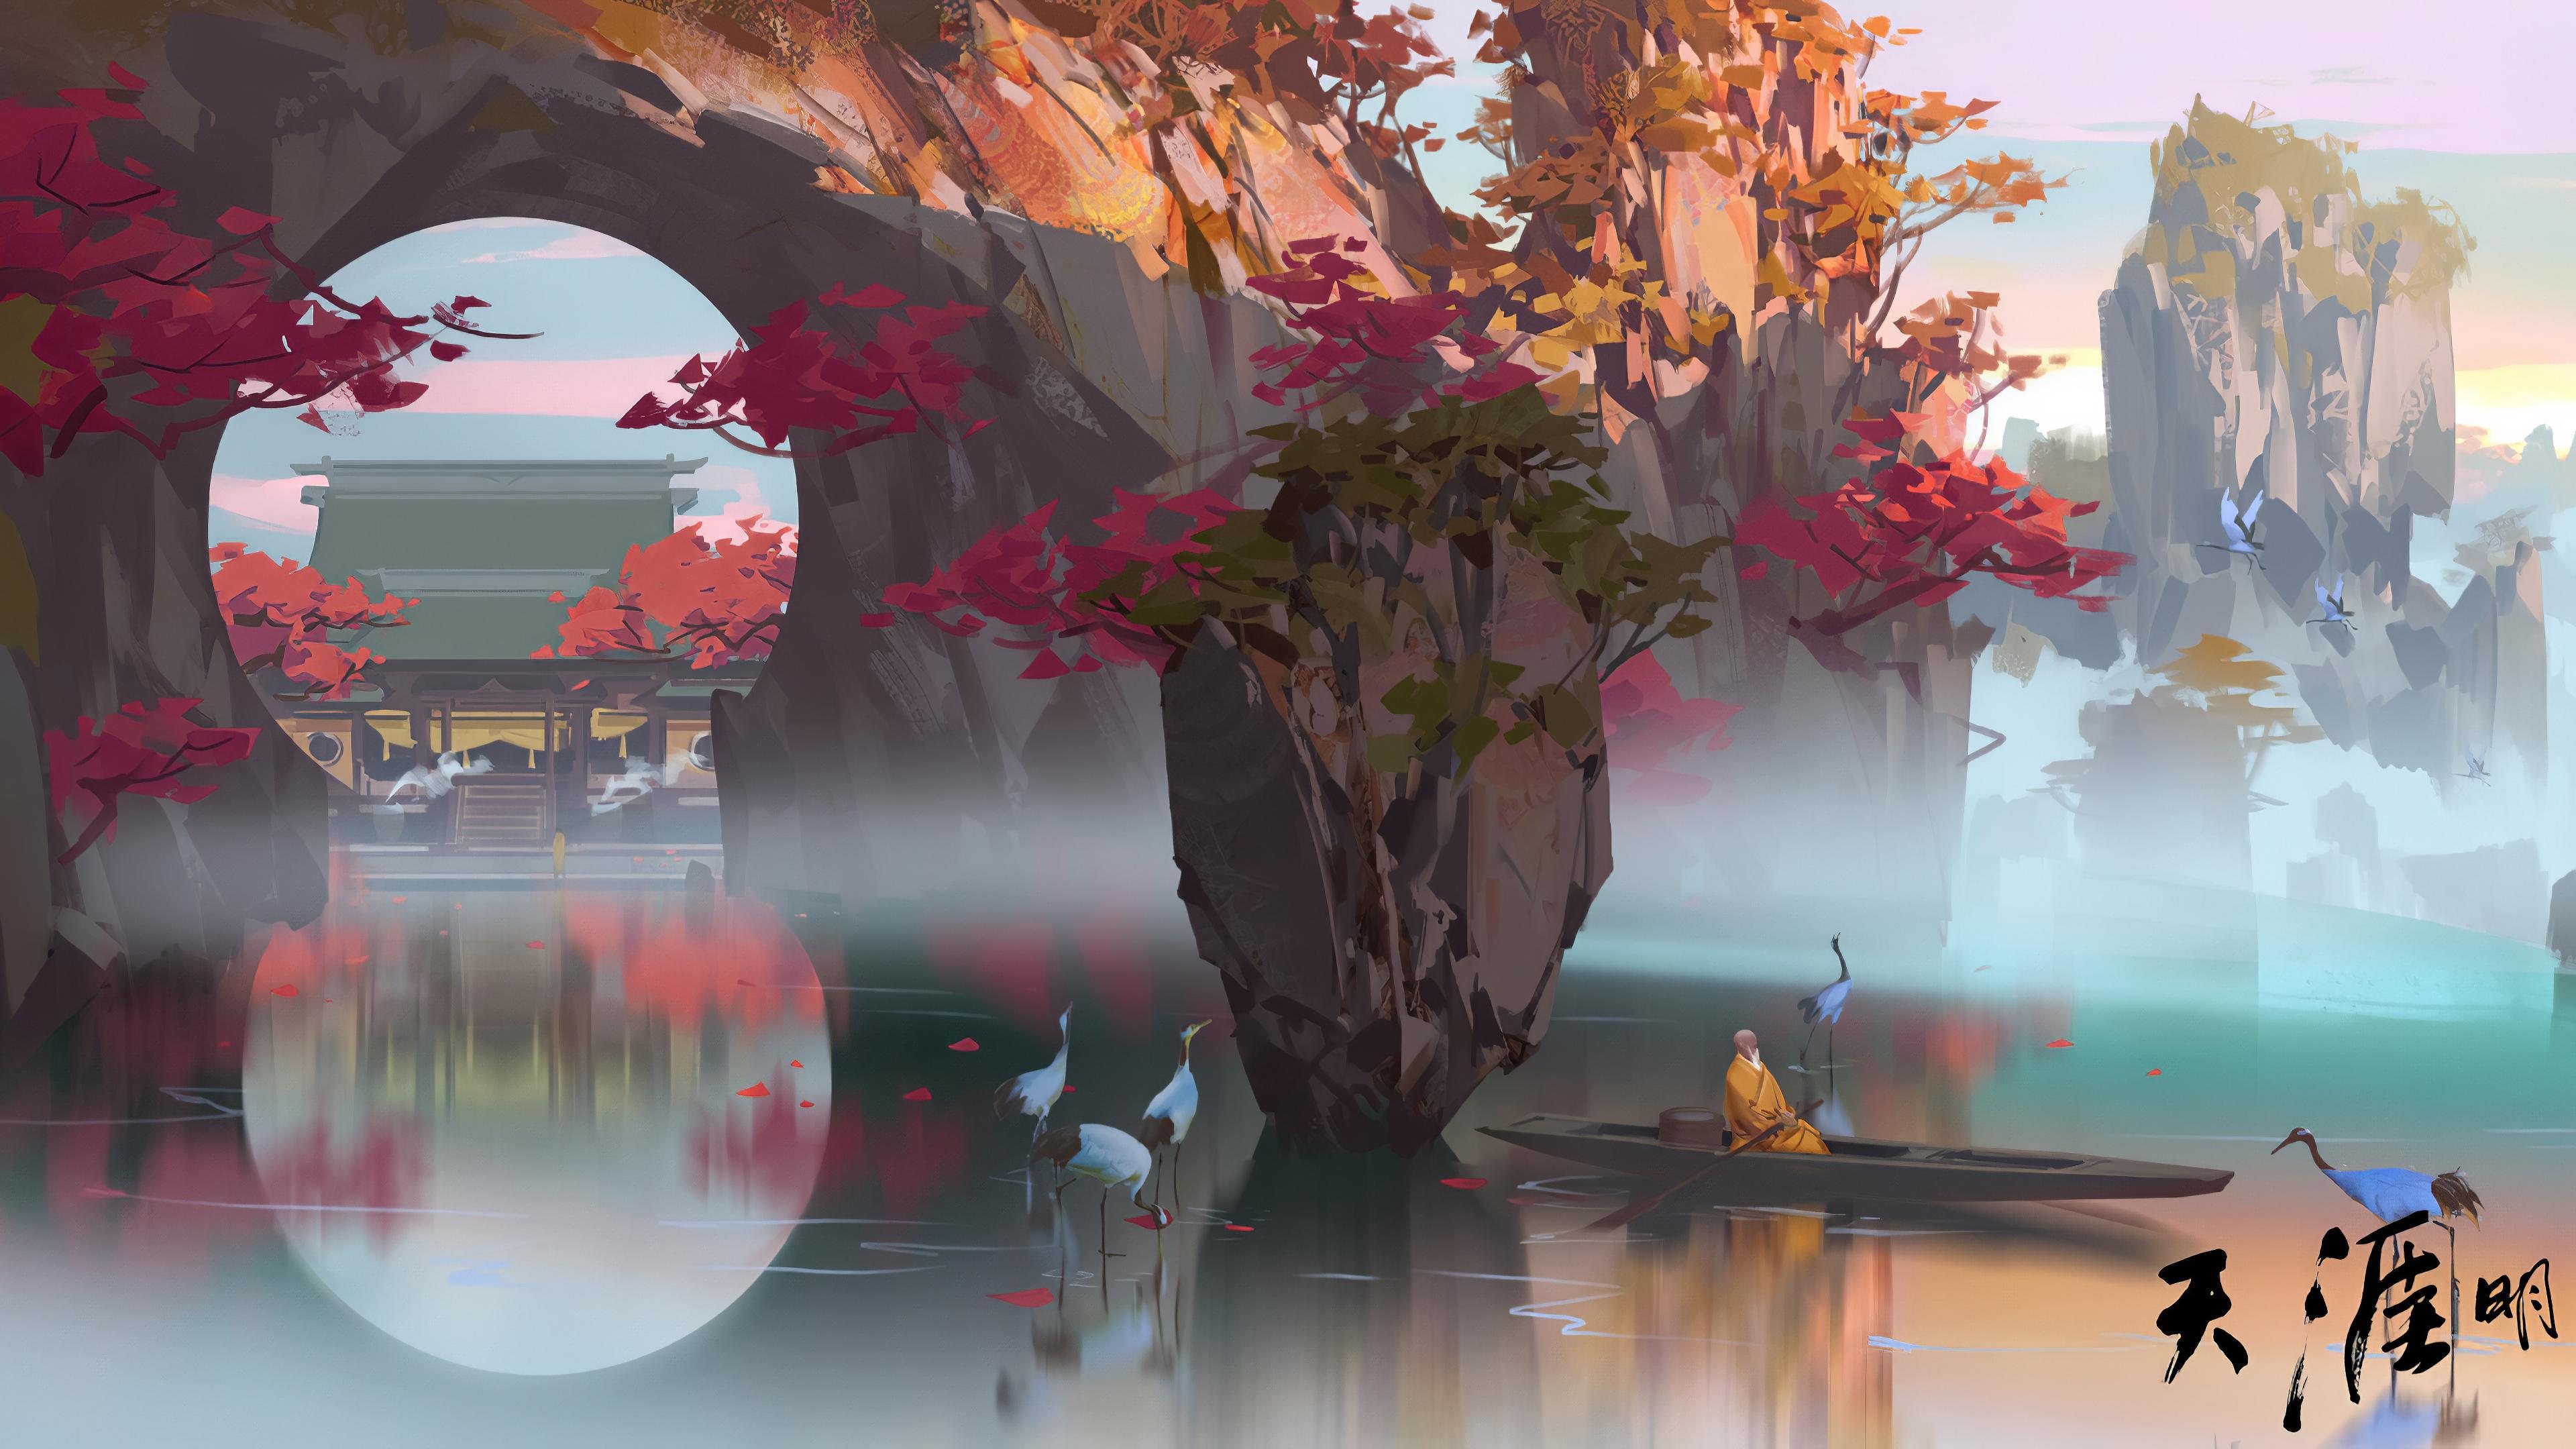 Озеро Шаолинь озеро Китай